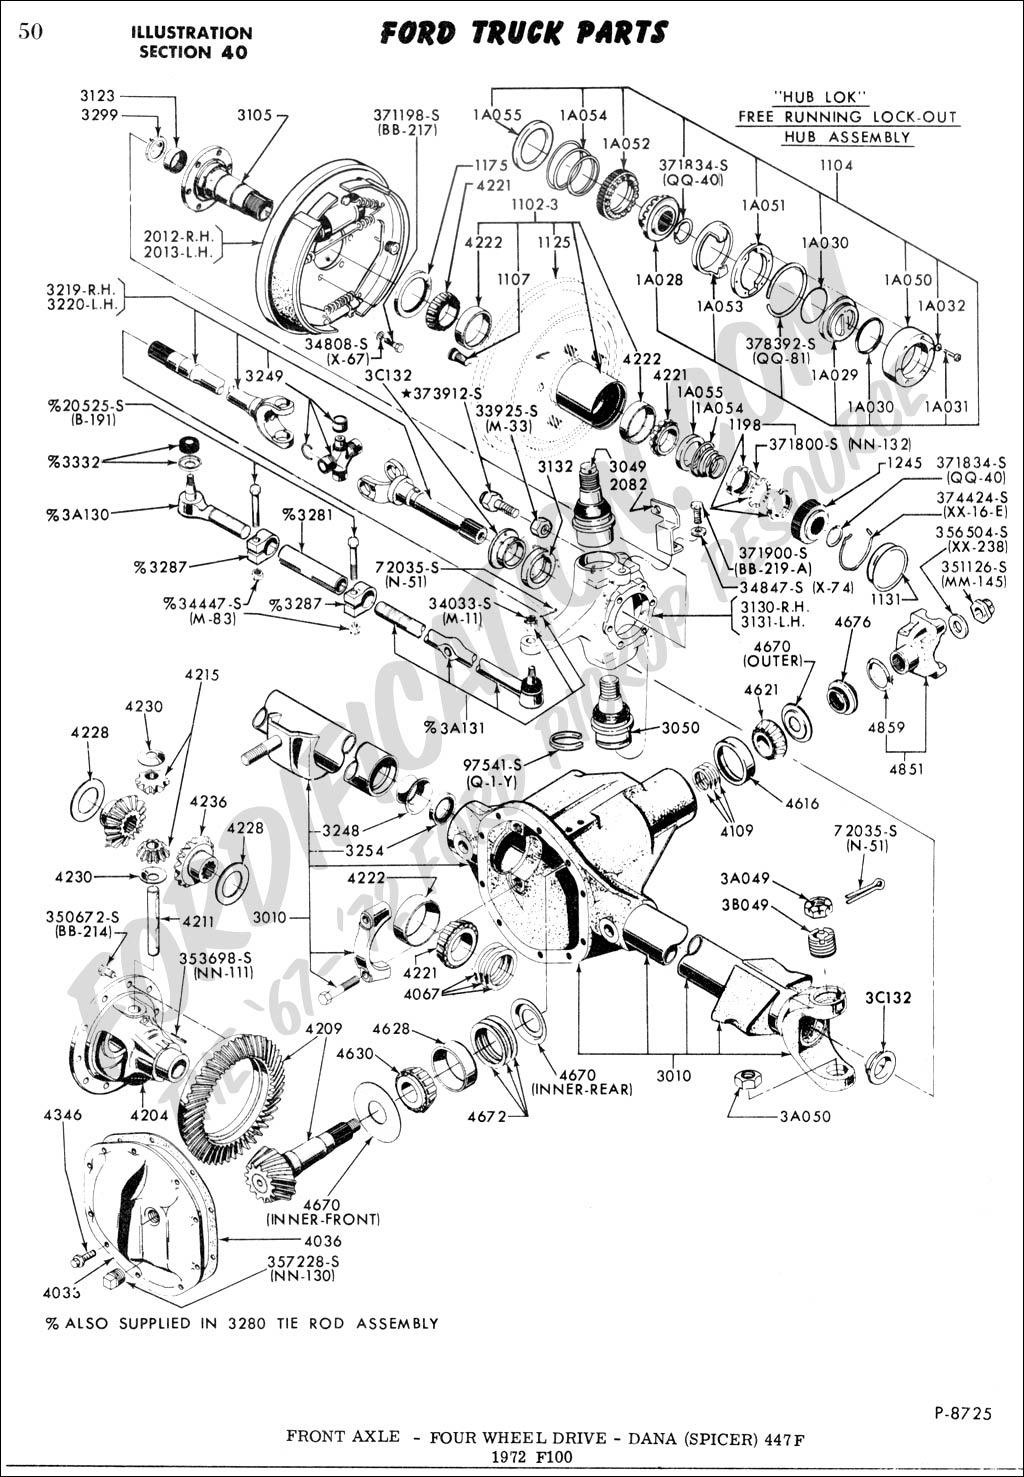 1978 ford 4x4 hub assembly diagram